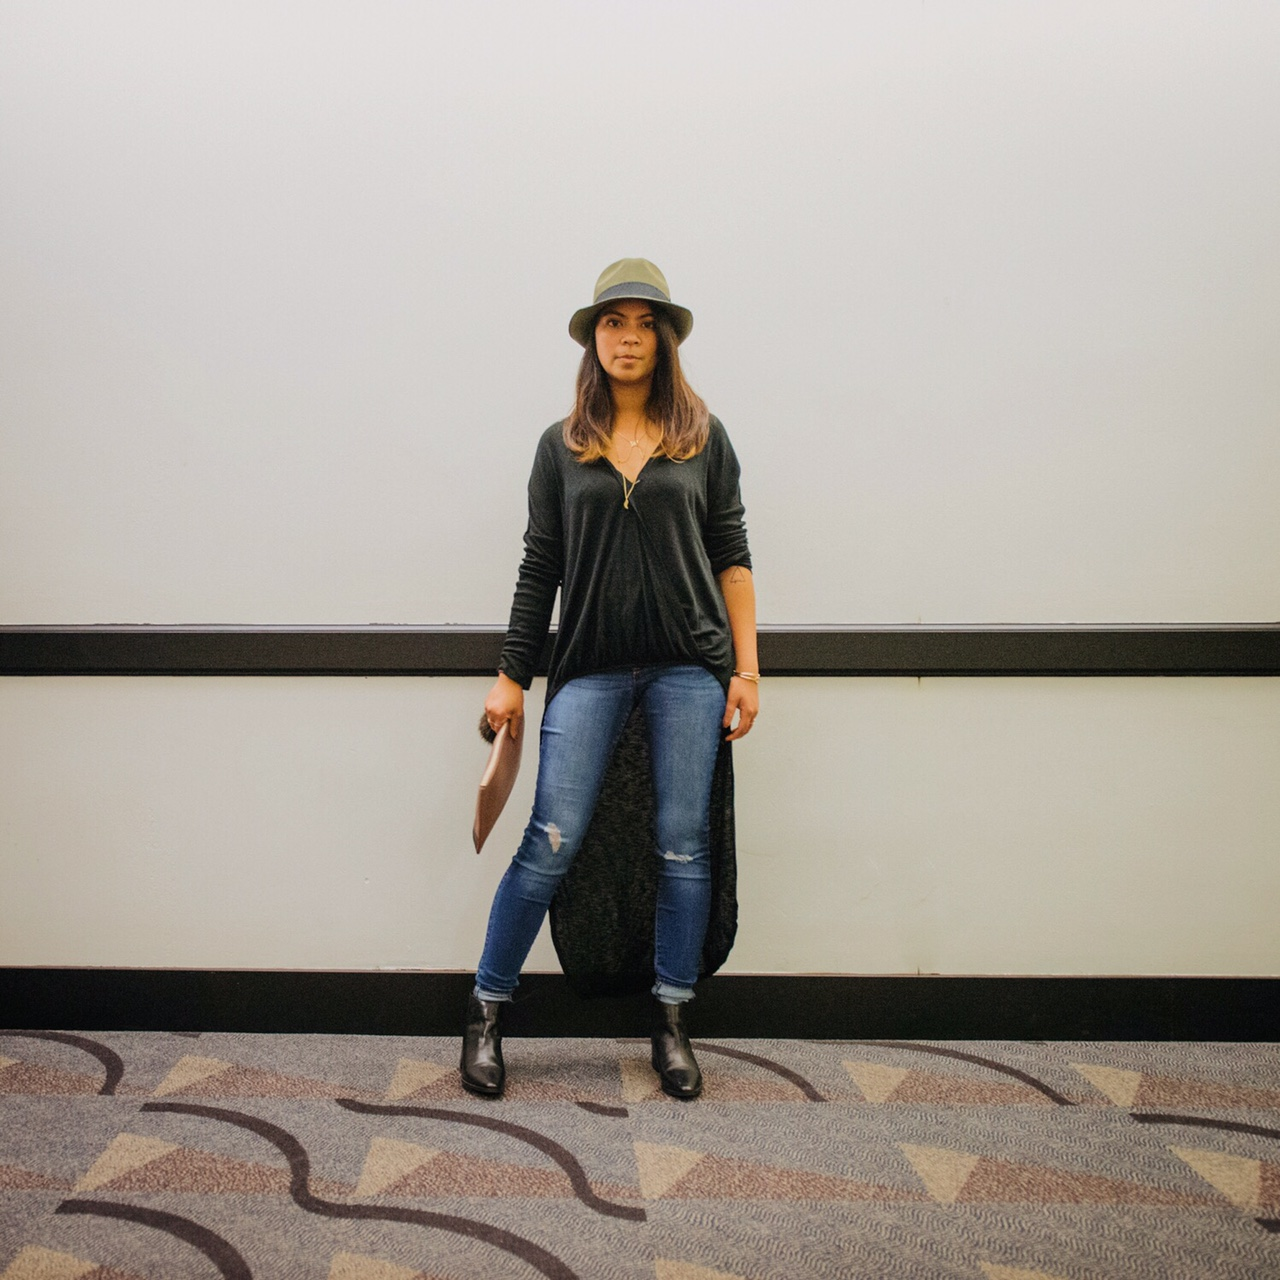 blog post, portland blogger, pdx fashion blogger, lifestyle blogger, staying motivated, life talks